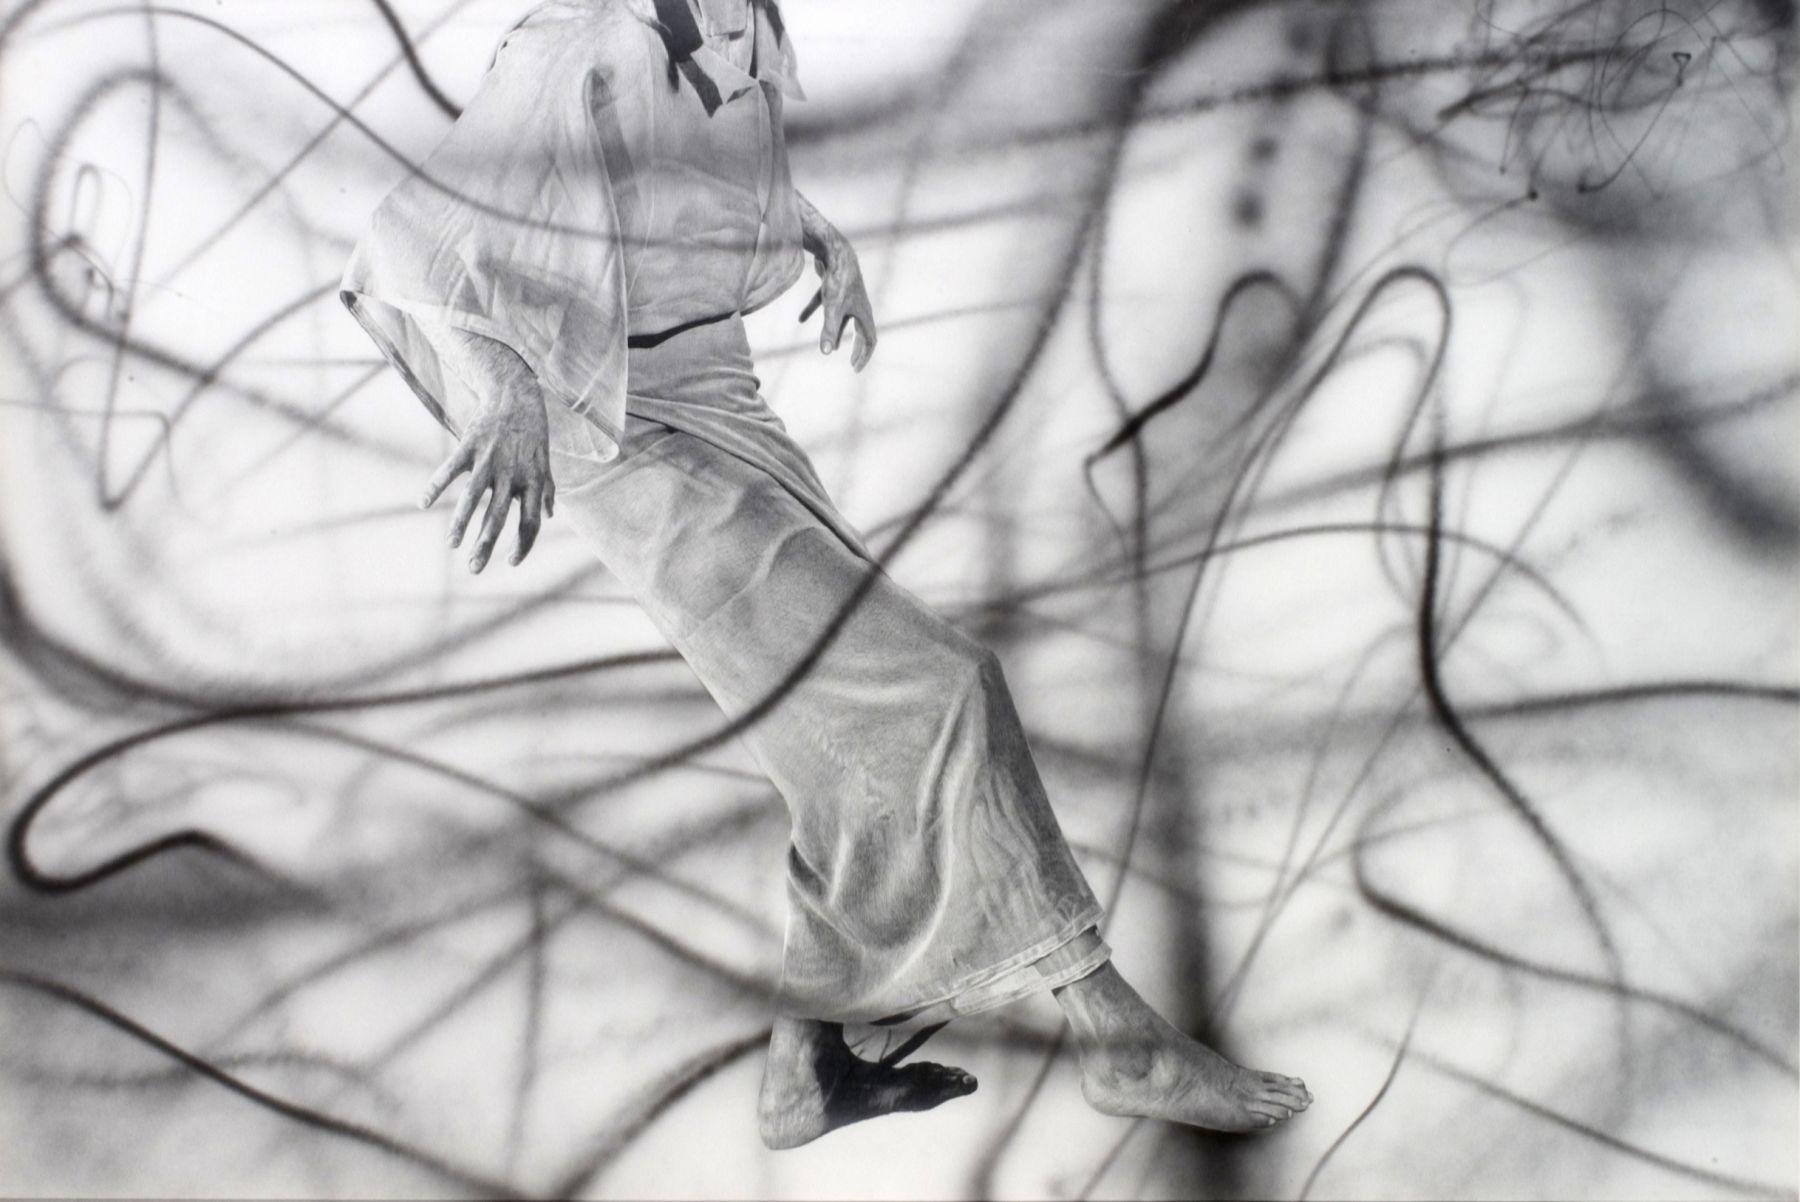 Untitled (Dane's body), 2004